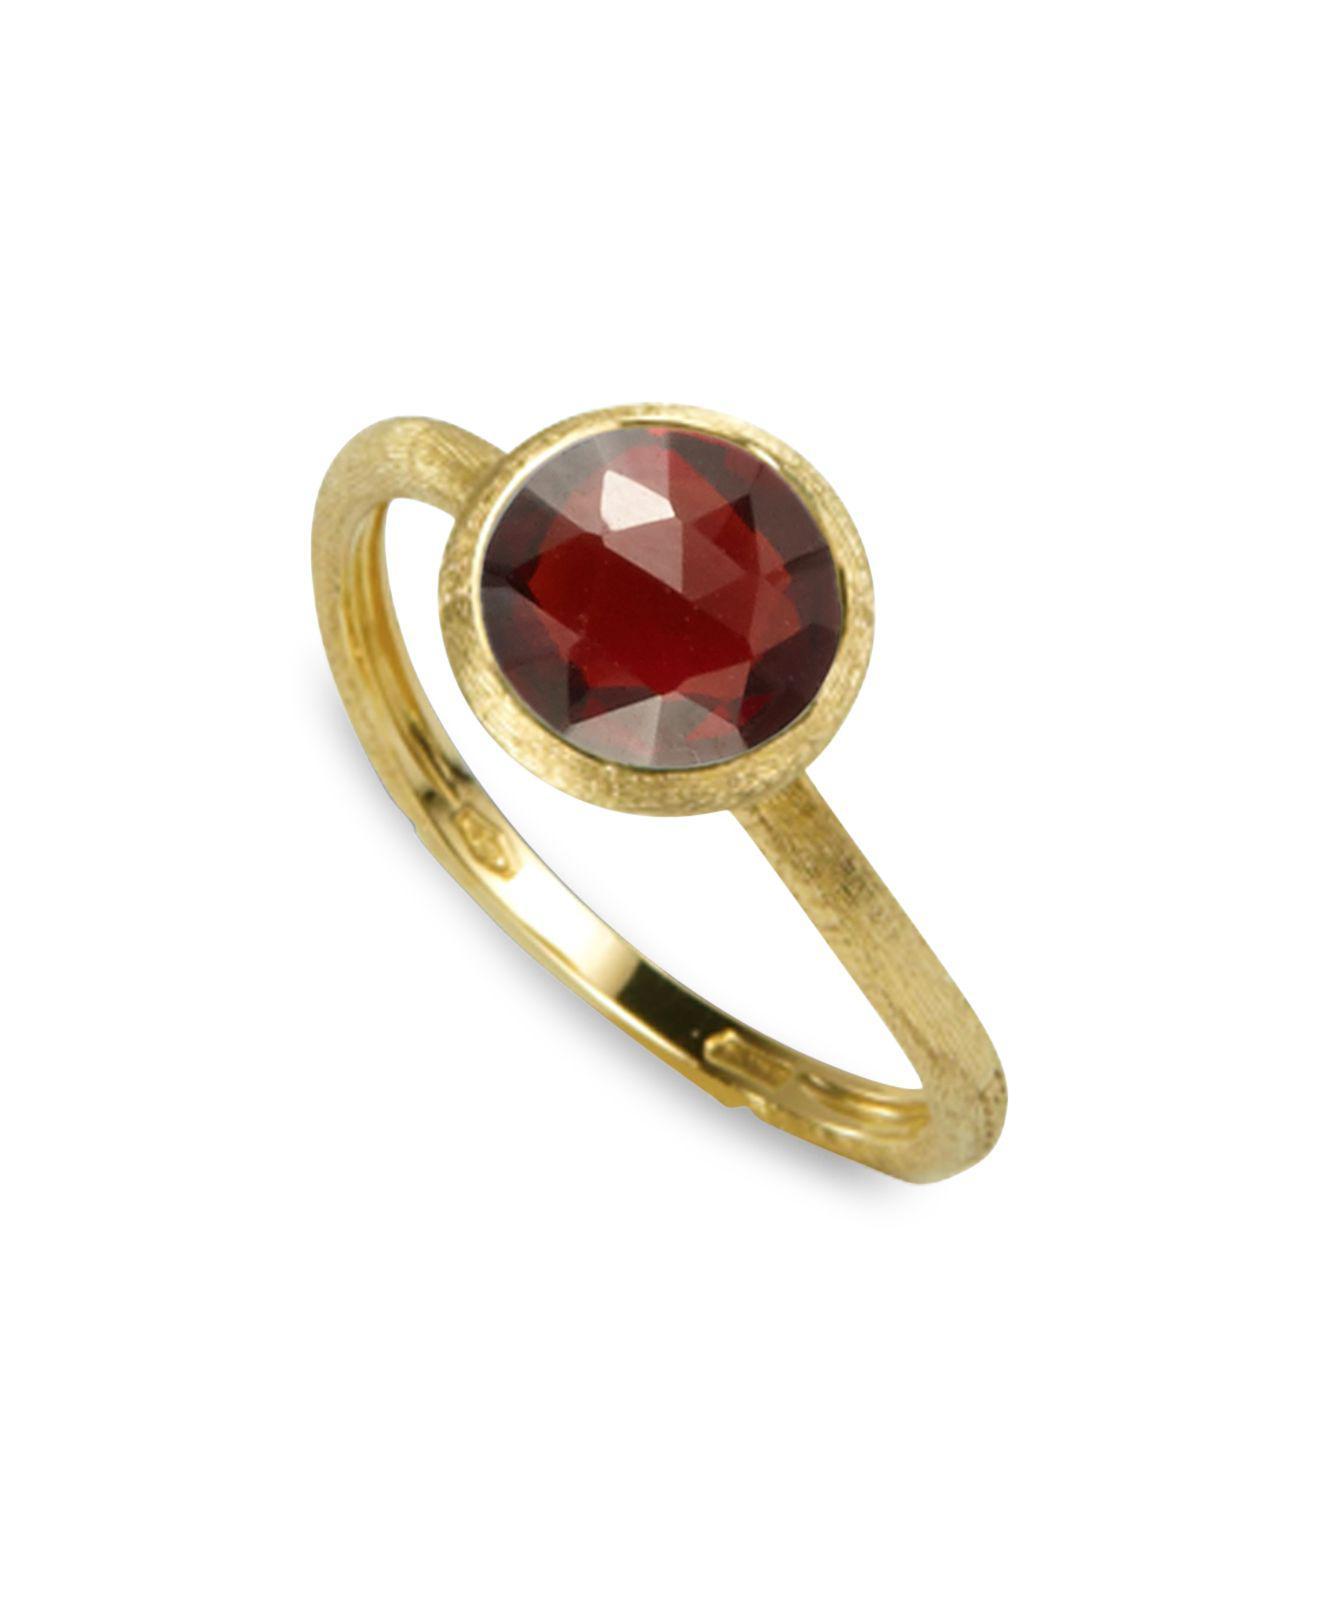 Marco Bicego Jaipur 18K Diamond Bezel Ring P9NH7T6pHW